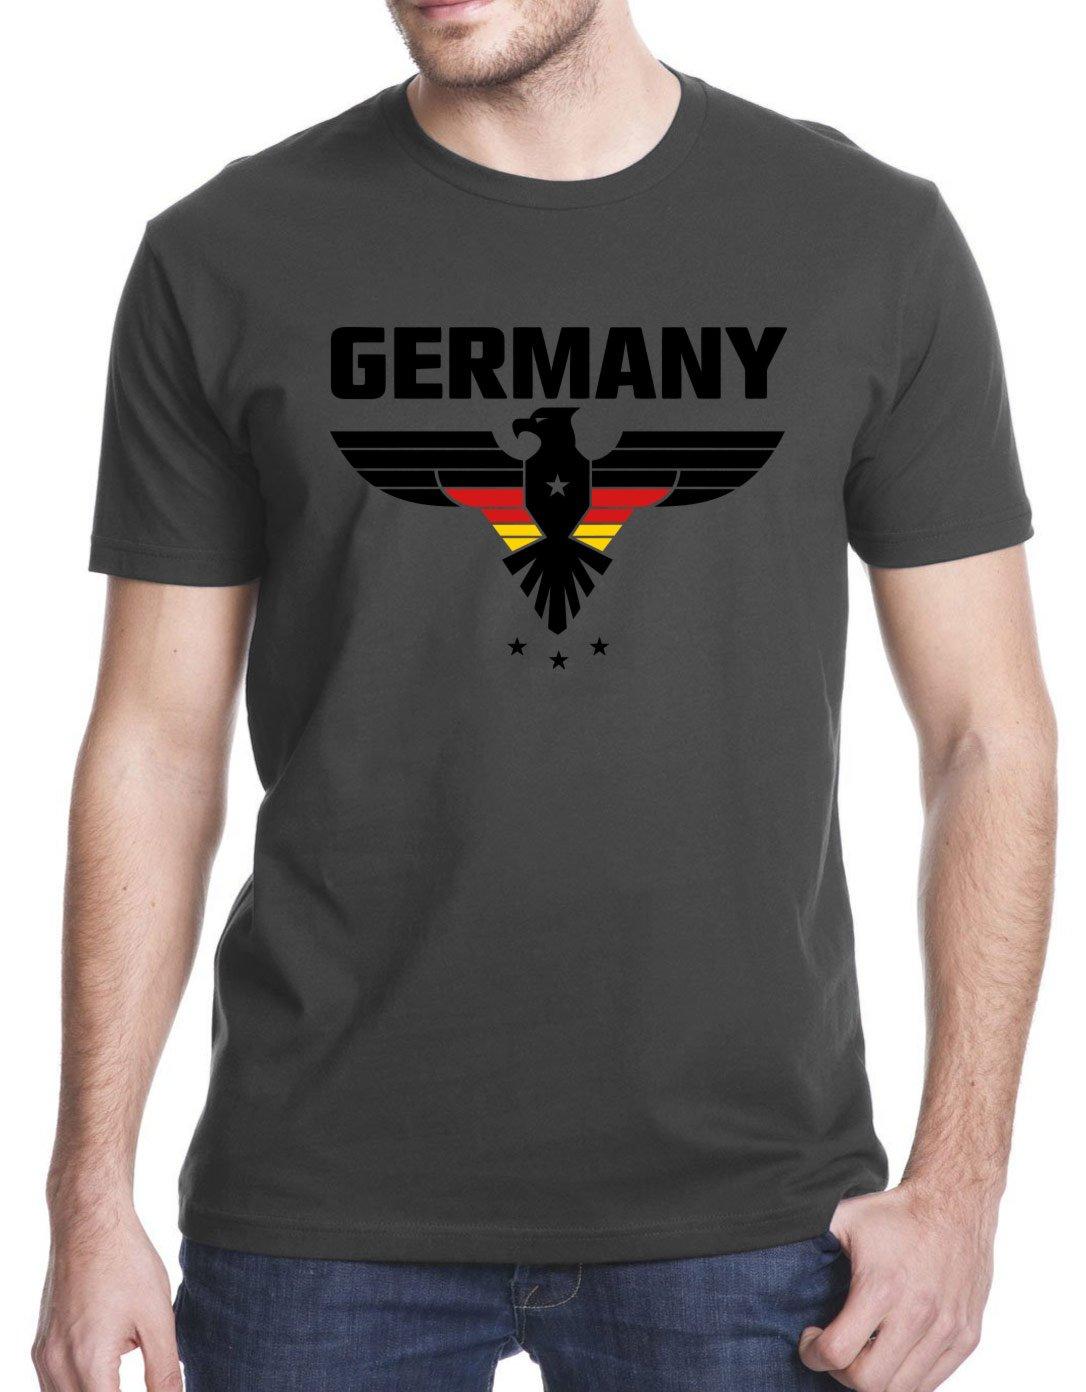 Germany Eagle T Shirt 8697